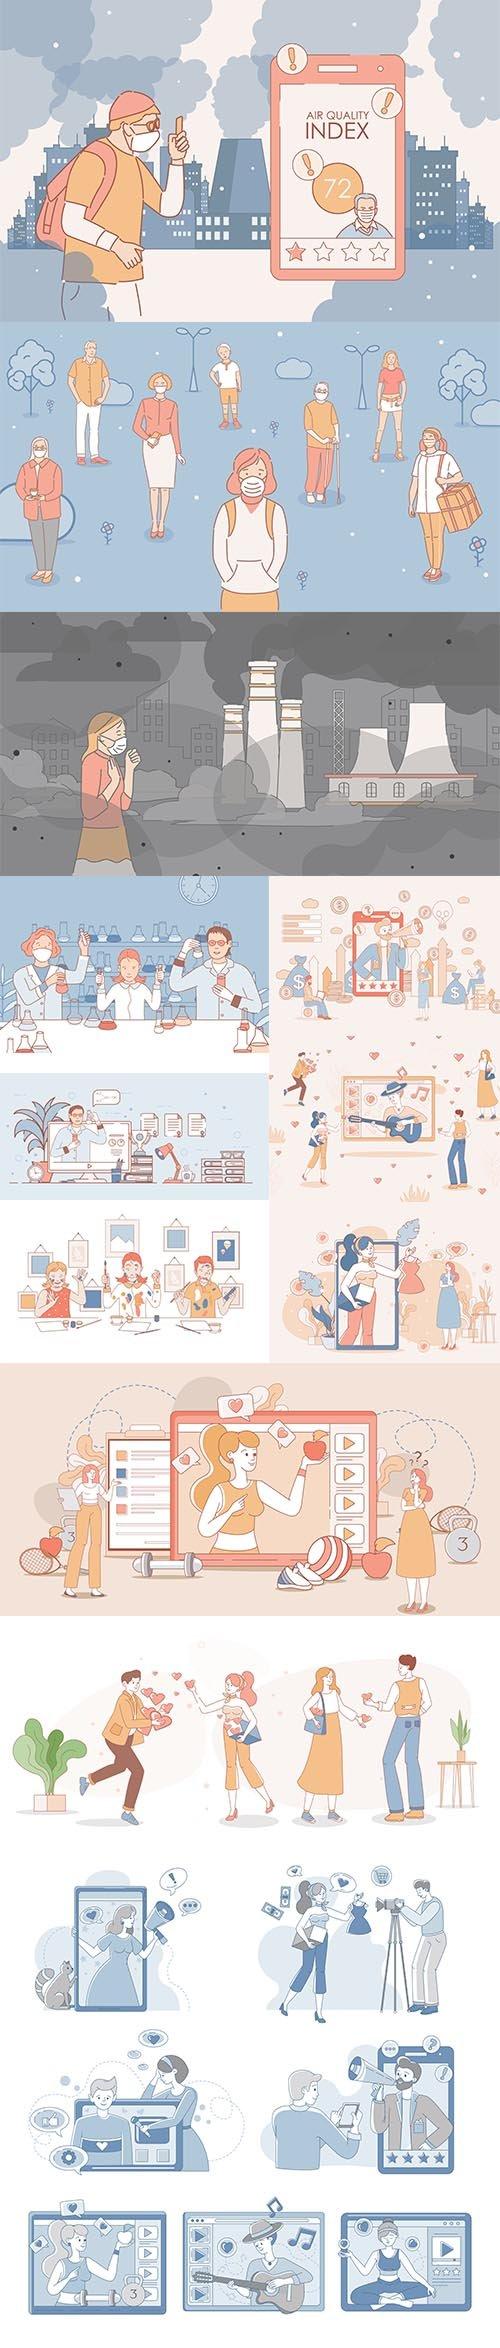 Paints People Cartoon Outline Illustration